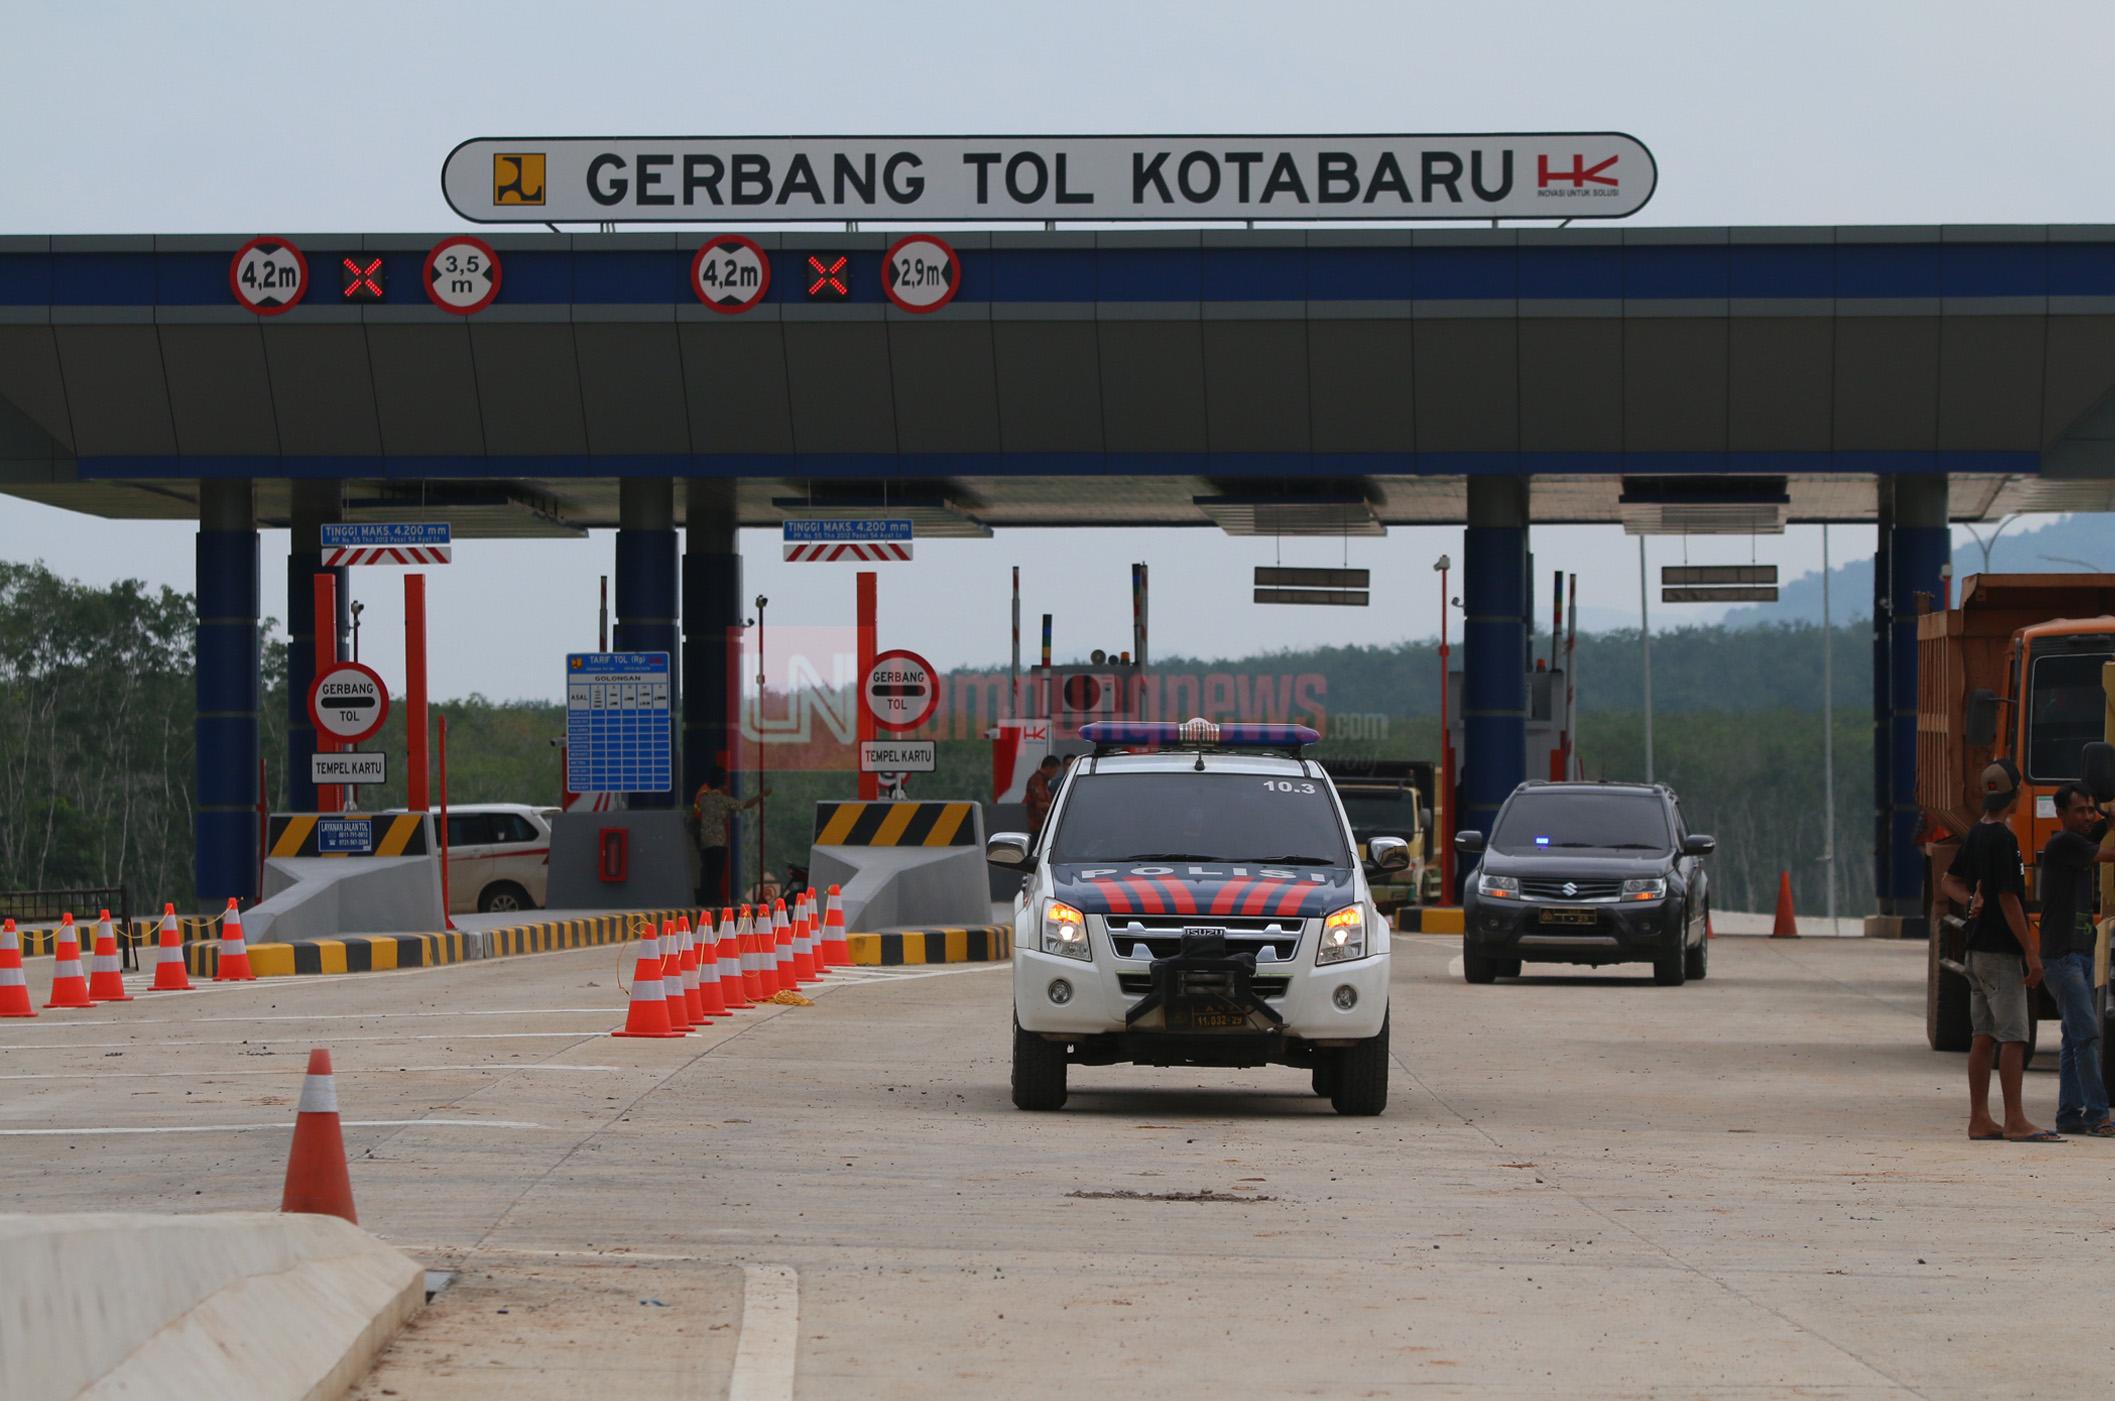 Jajaran Polres Lampung Selatan meninjau lokasi titik kunjungan Presiden RI Joko Widodo di Seksi 2 Gerbang Tol Kotabaru, Jumat (19/1). Rencananya presiden akan meresmikan Seksi 1 Bakauheni Selatan (Pelabuhan)-Bakauheni Utara (Desa Hatta) sepanjang 8,9 km dan Seksi 2 Lematang (Ir. Sutami) - Kotabaru (Itera) sepanjang 5 km pada Minggu (21/1). (Lampungnews.com/El Shinta)